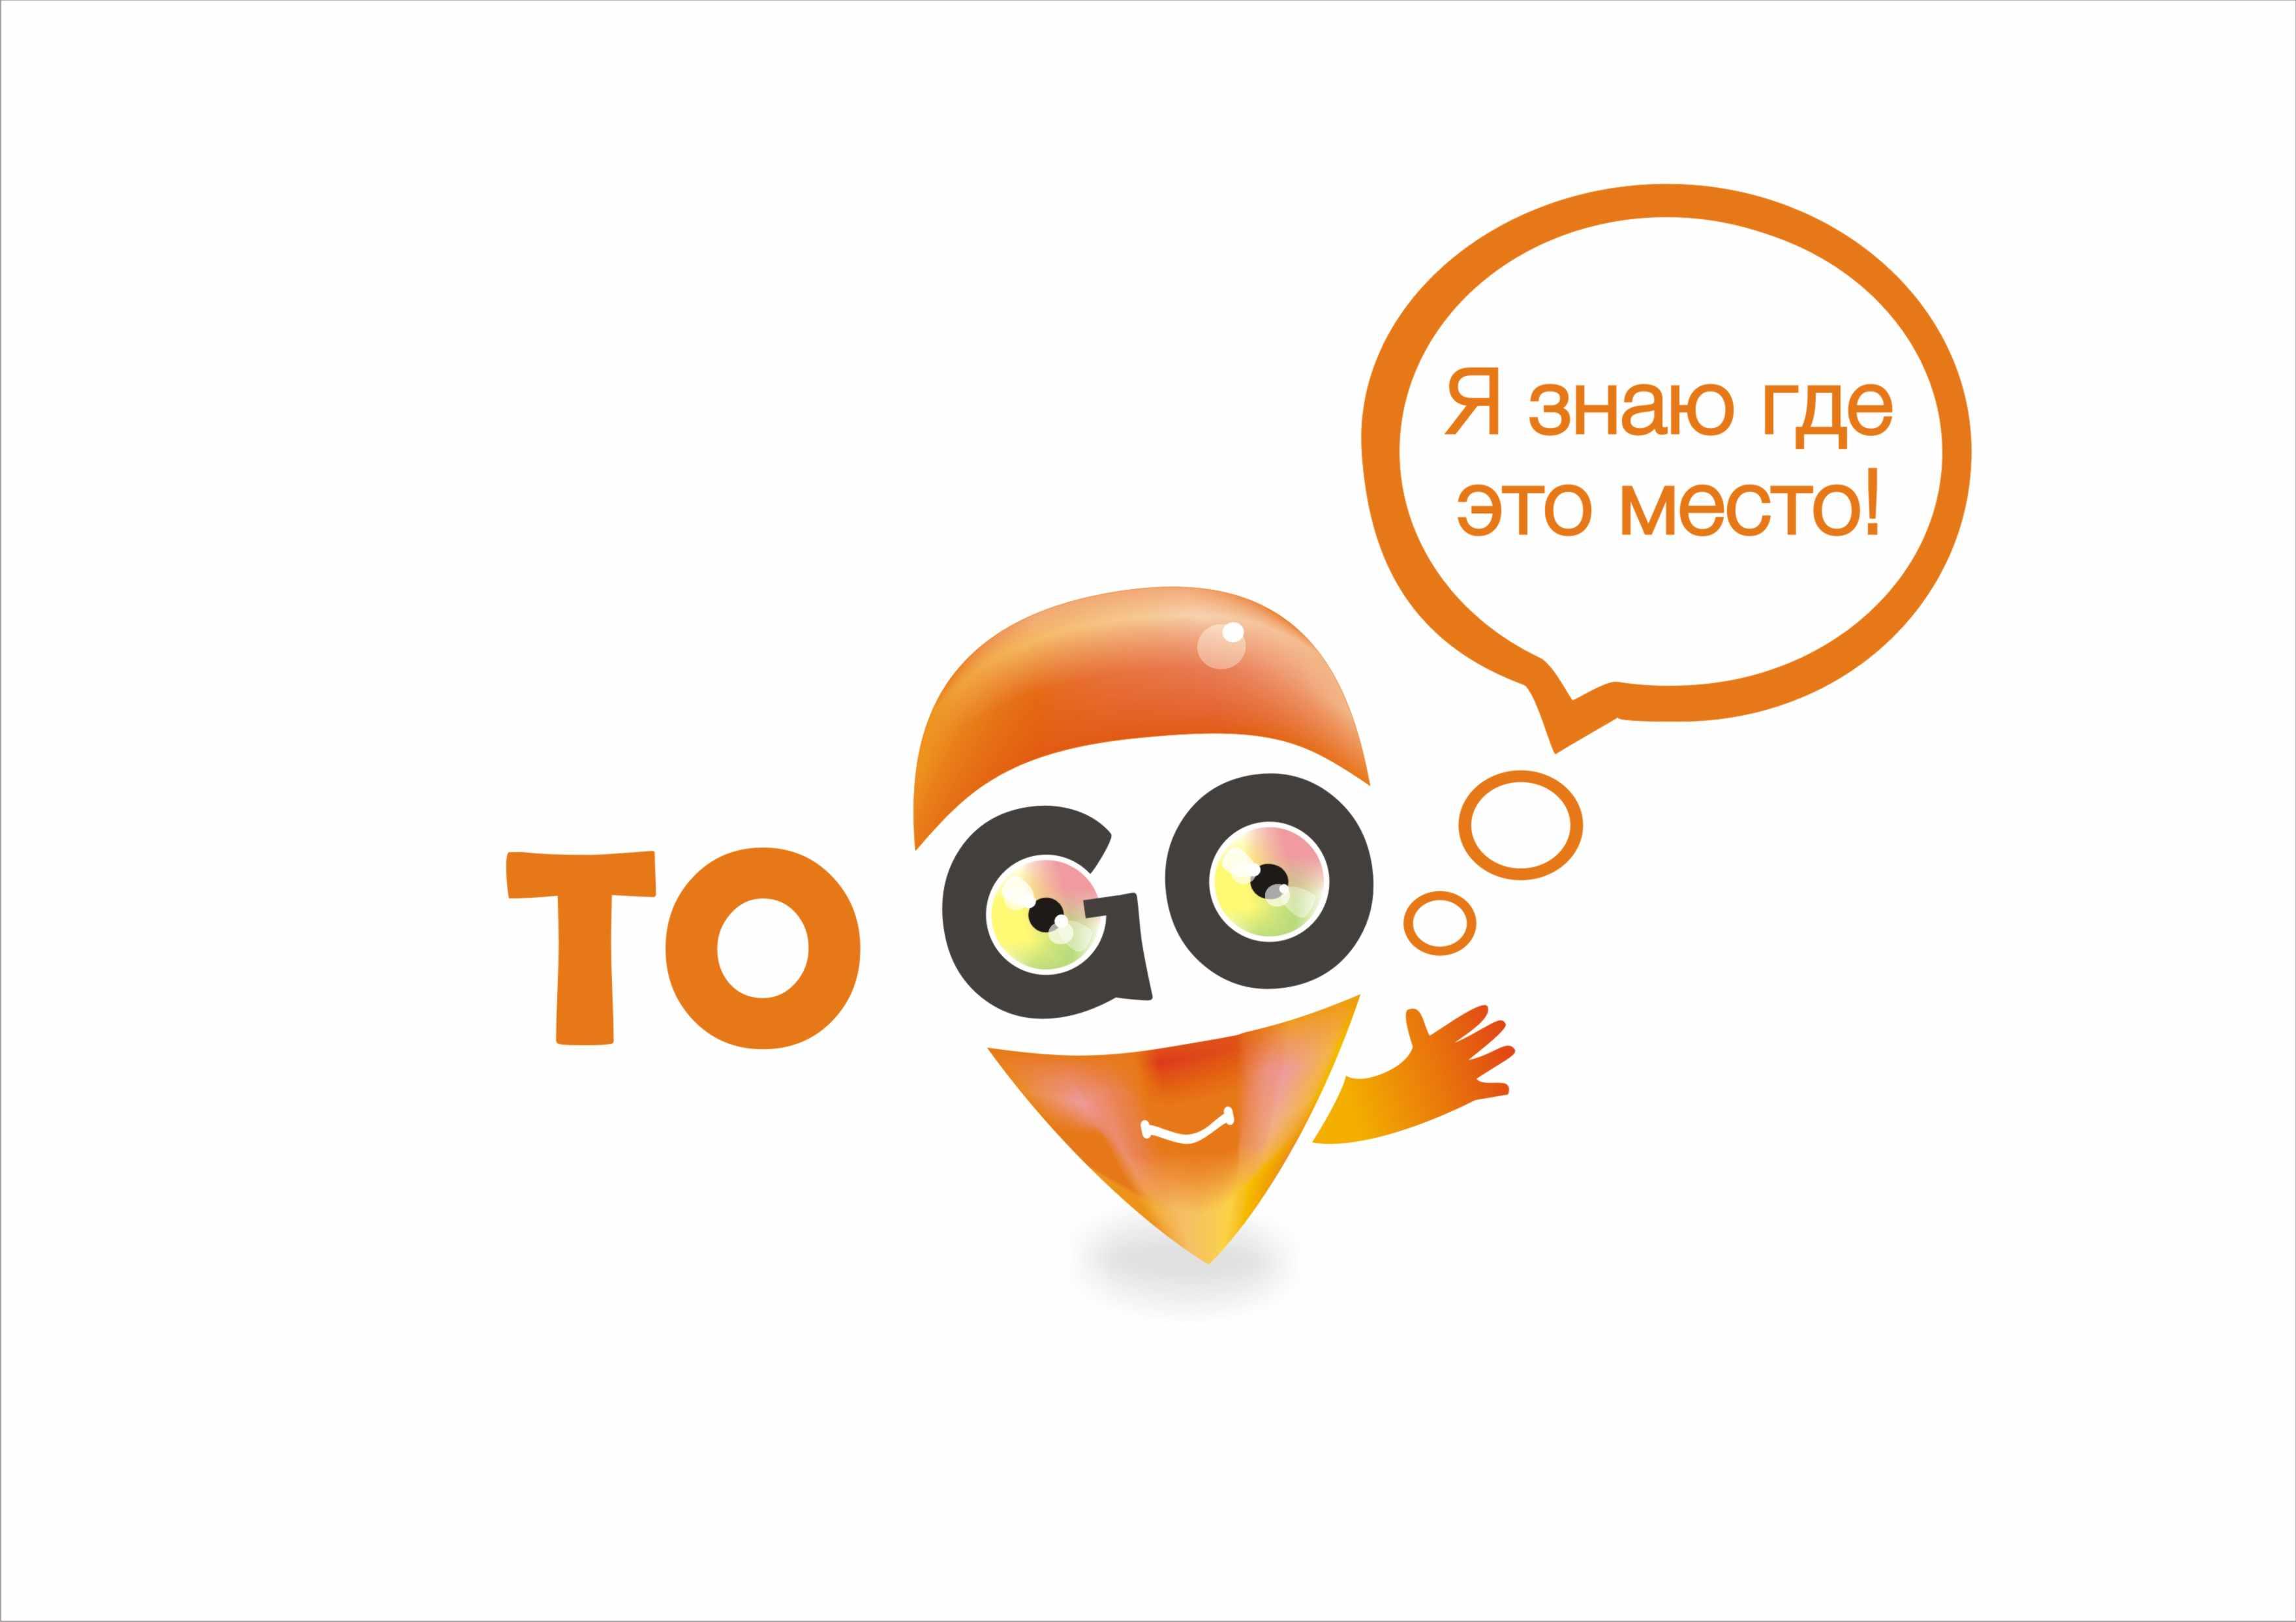 Разработать логотип и экран загрузки приложения фото f_9225a83fe3004249.jpg